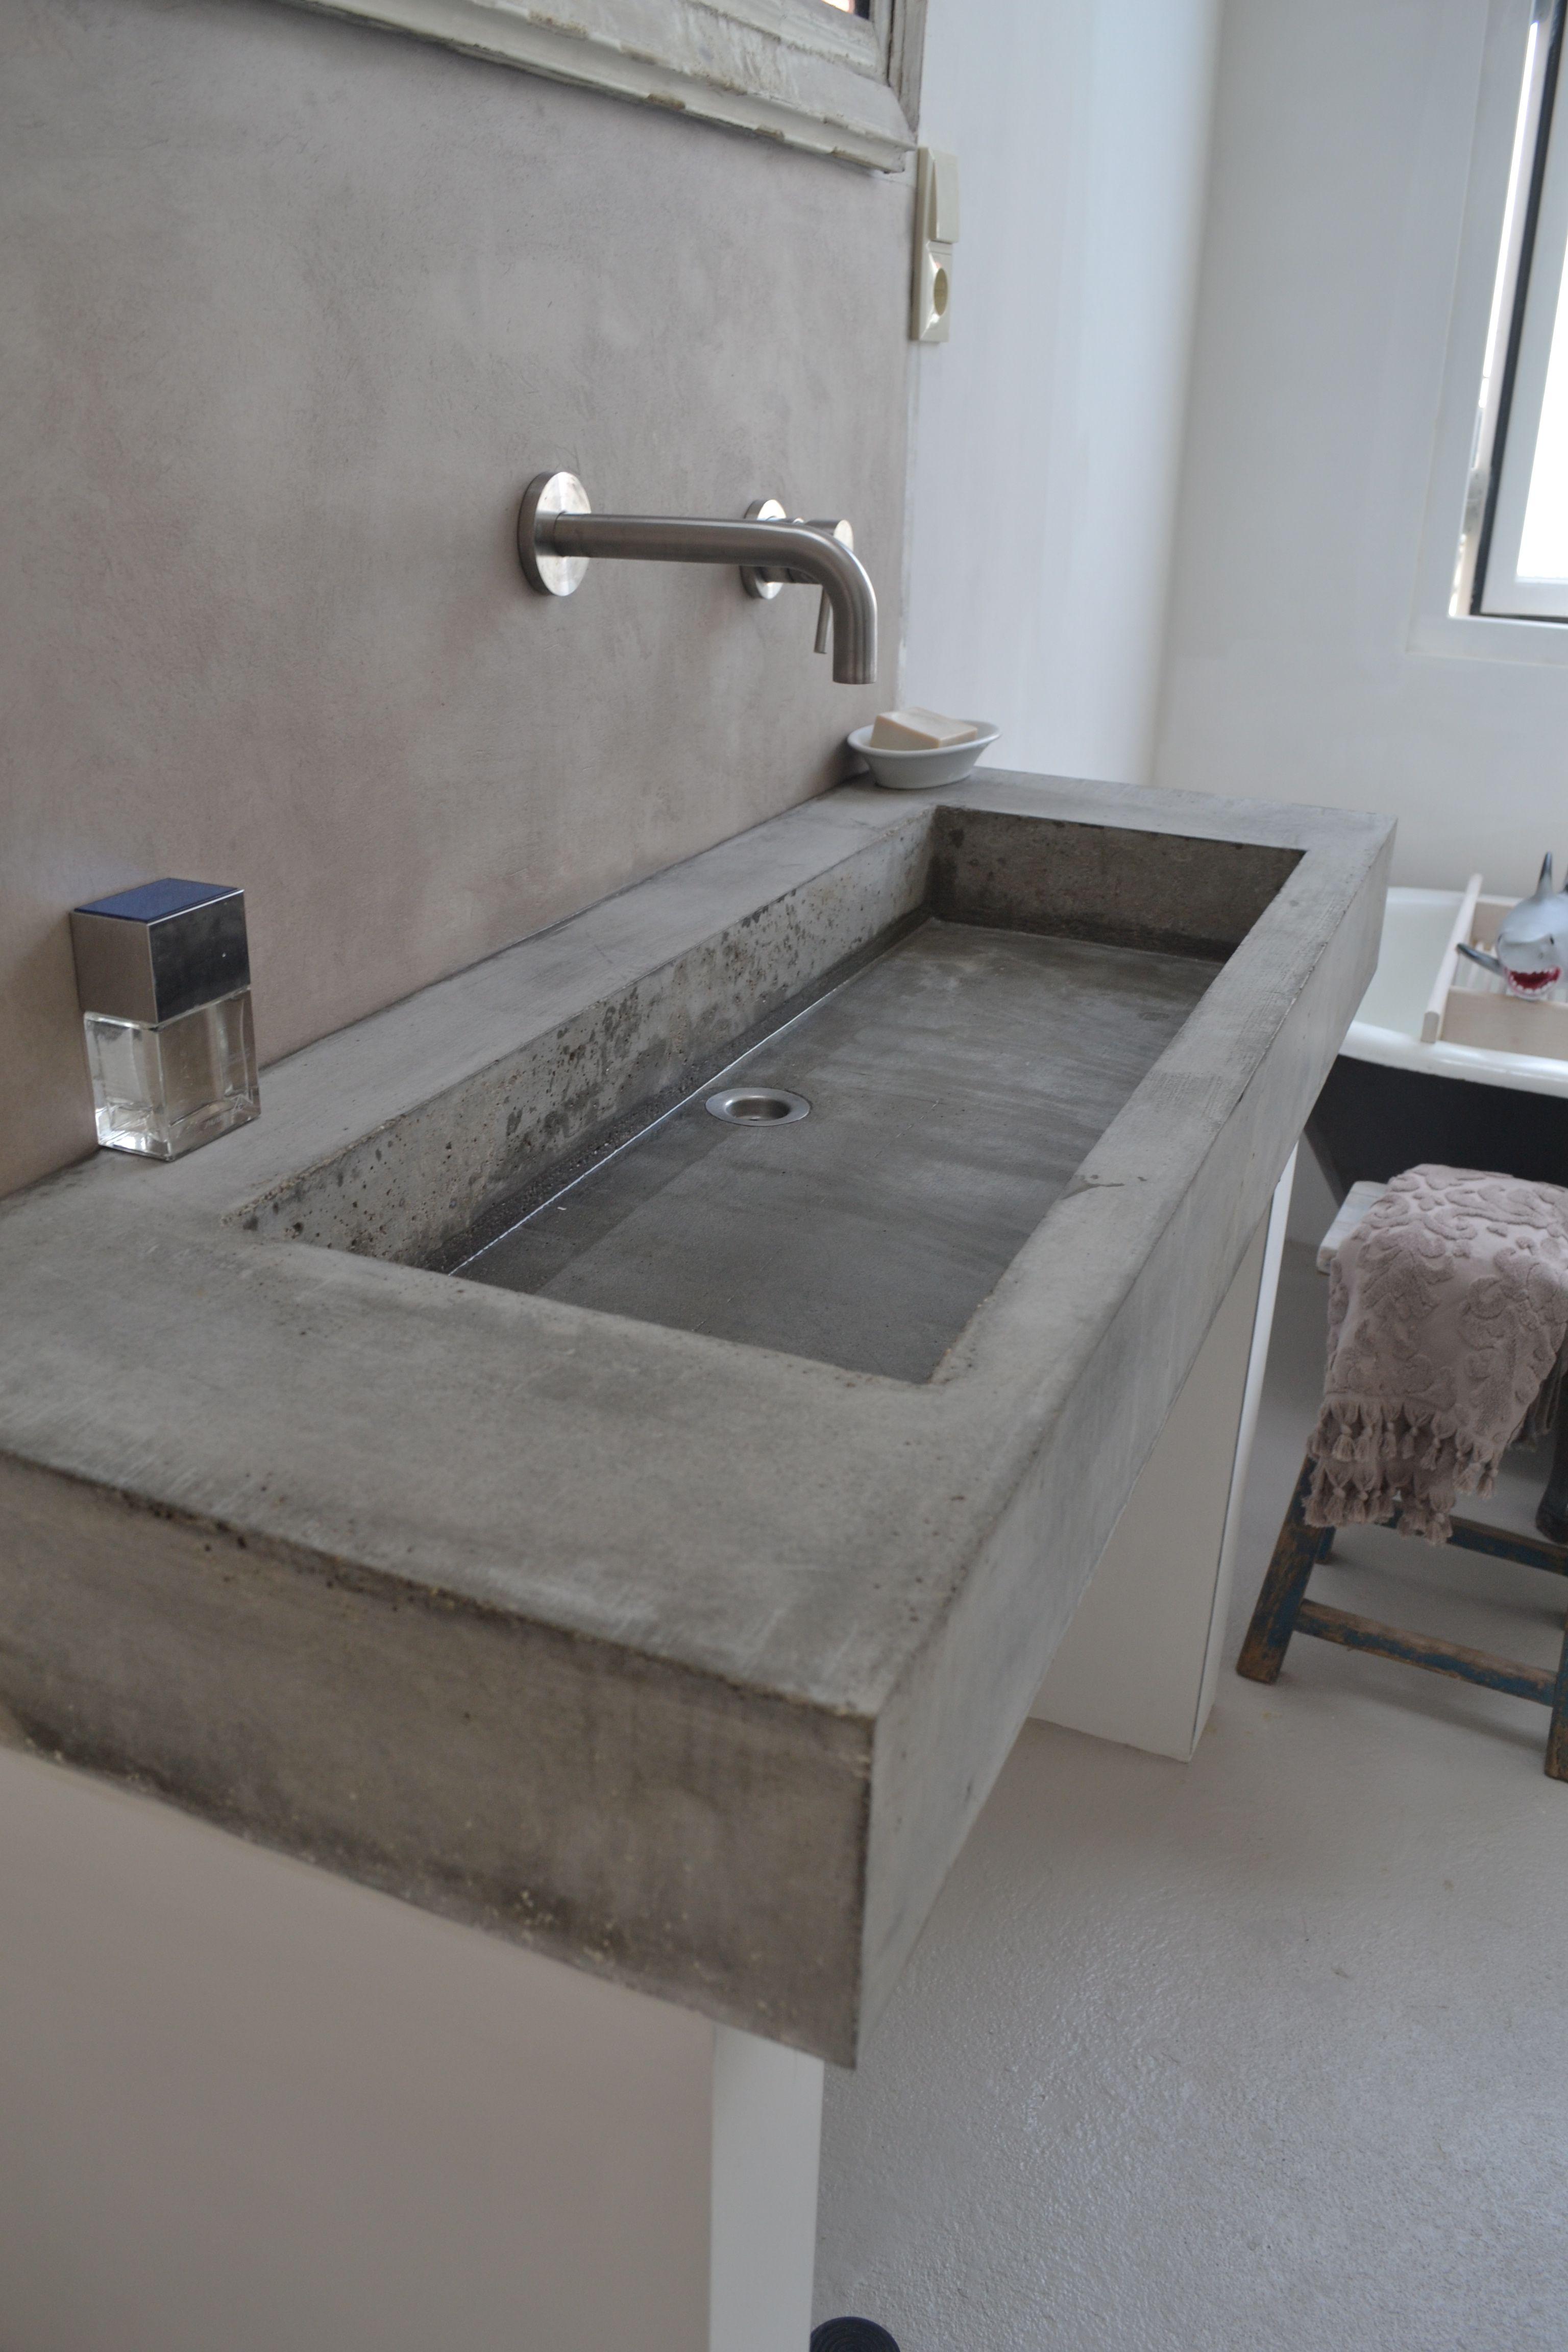 Concrete Bathroom Sinks That Make A Strong Statement Without Any Fuss Badkamer Wasbak Betonnen Wastafel Badkamer Wastafel